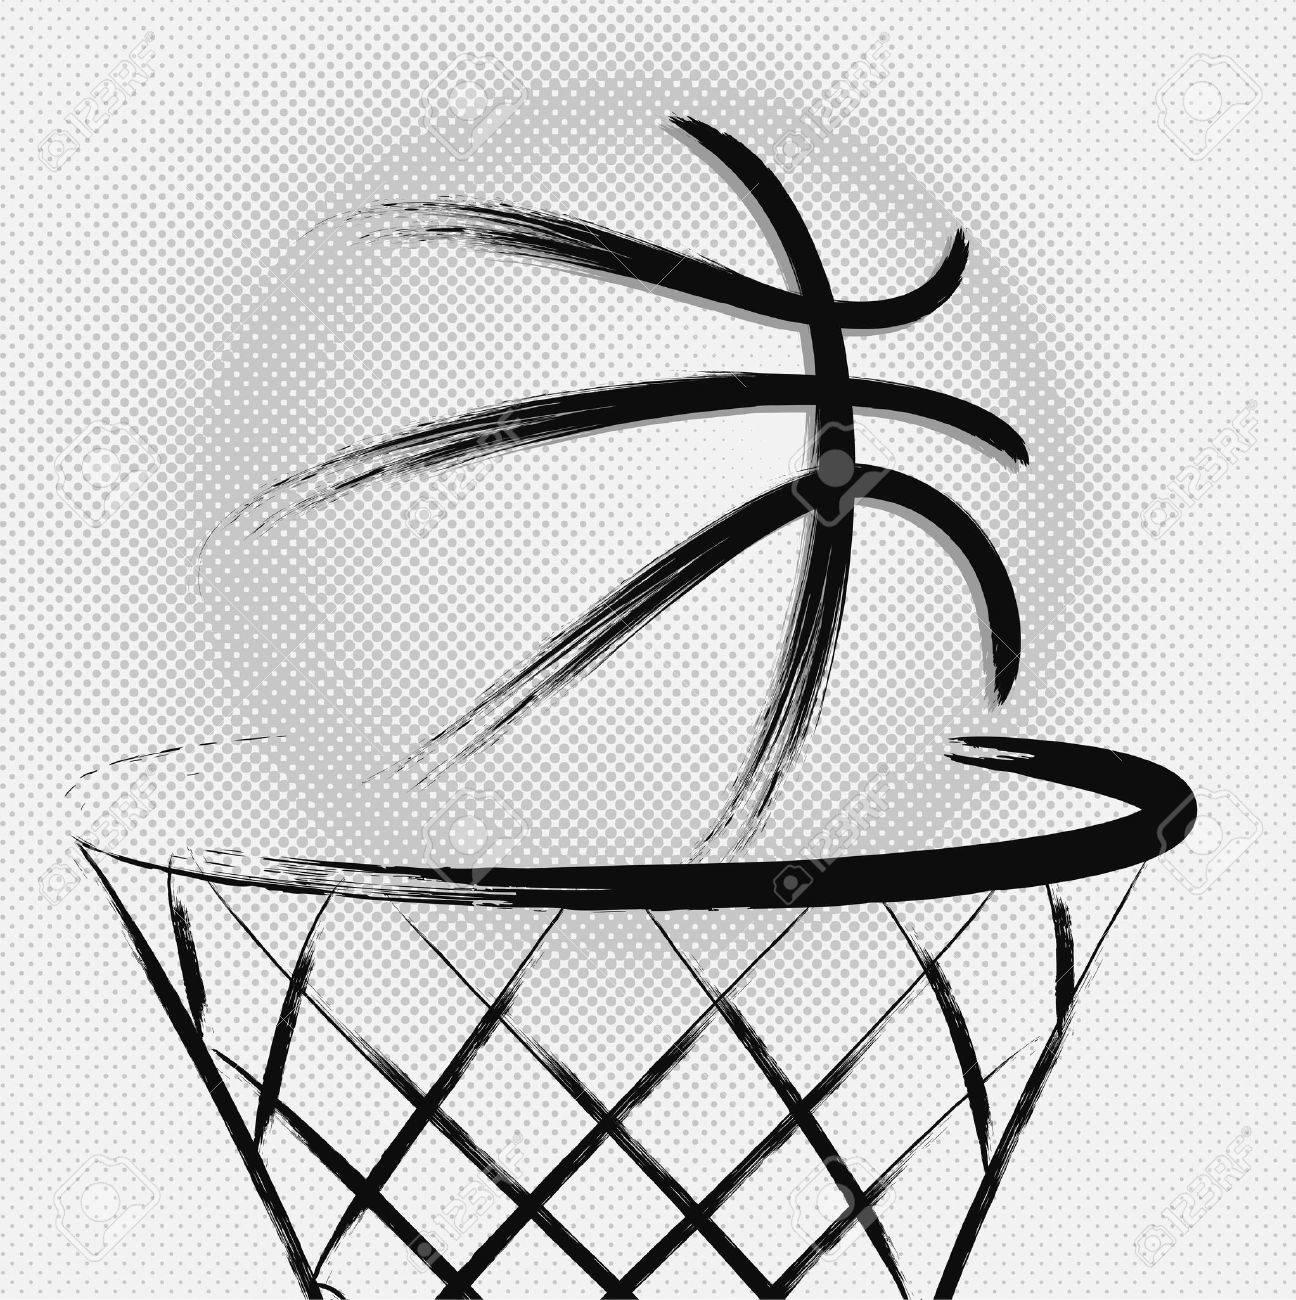 Basketball Vector Royalty Free Cliparts Vectors And Stock